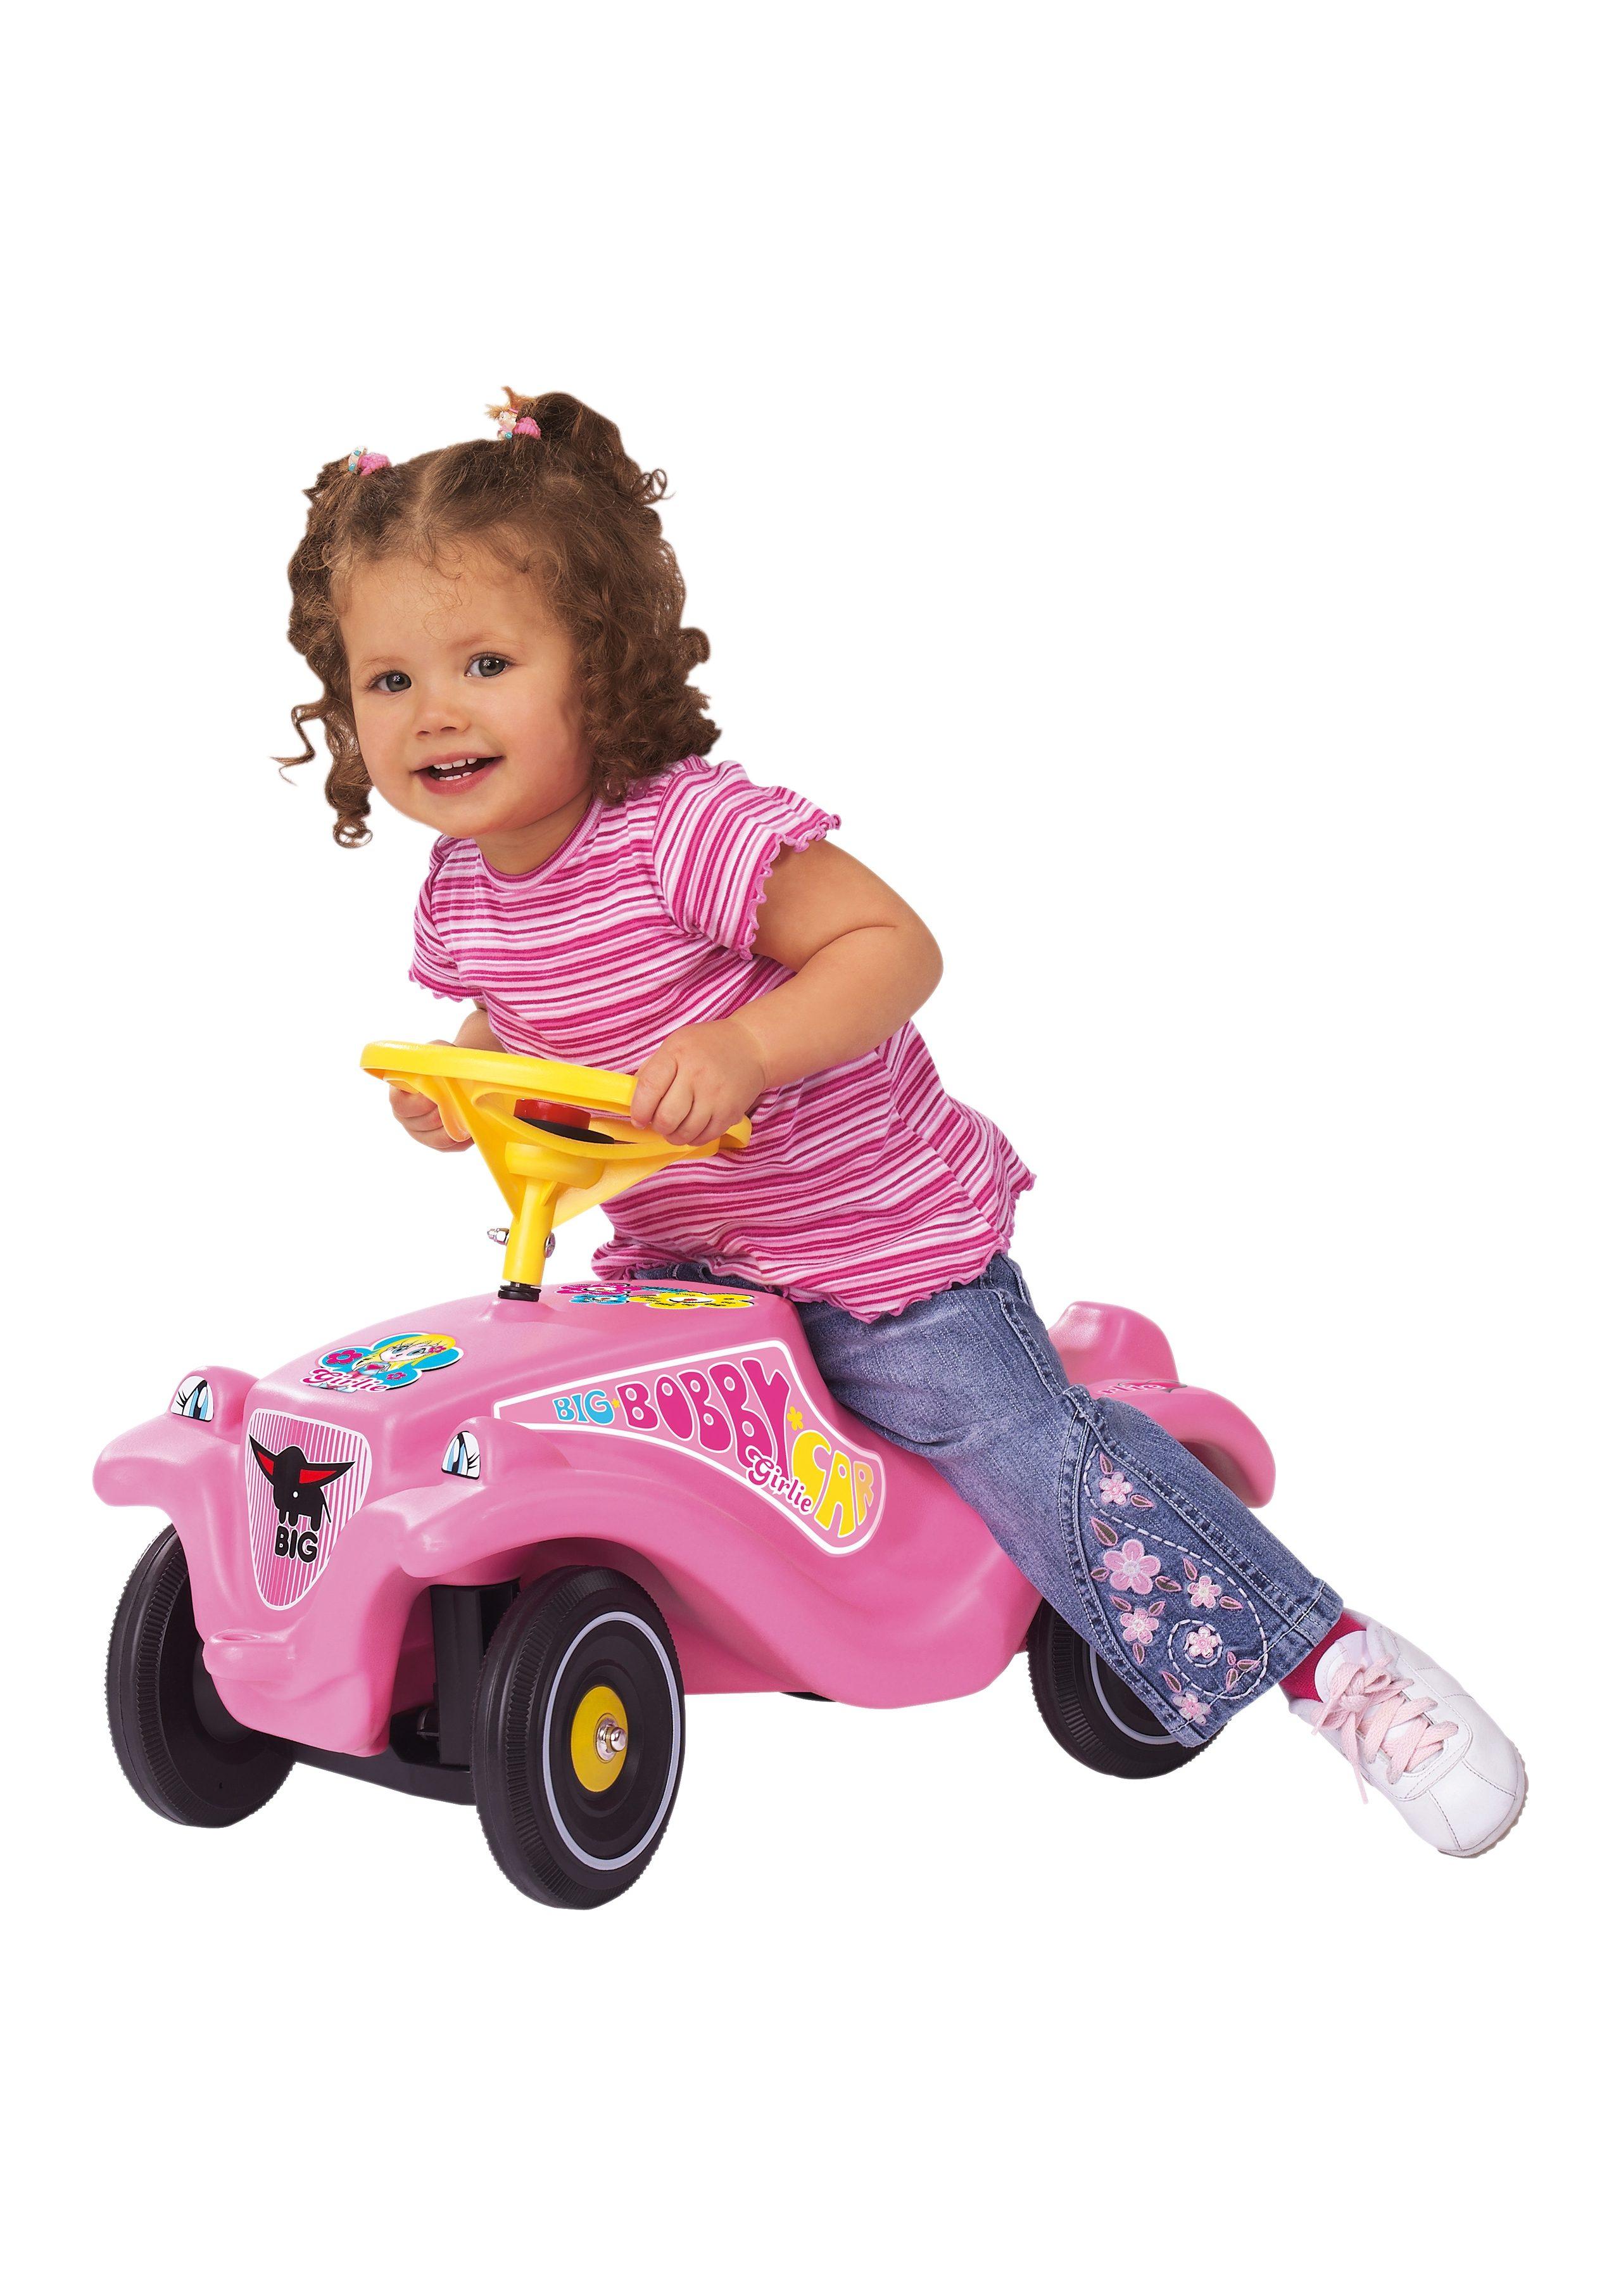 BIG Rutscherauto »Big Bobby Car Classic Girlie«